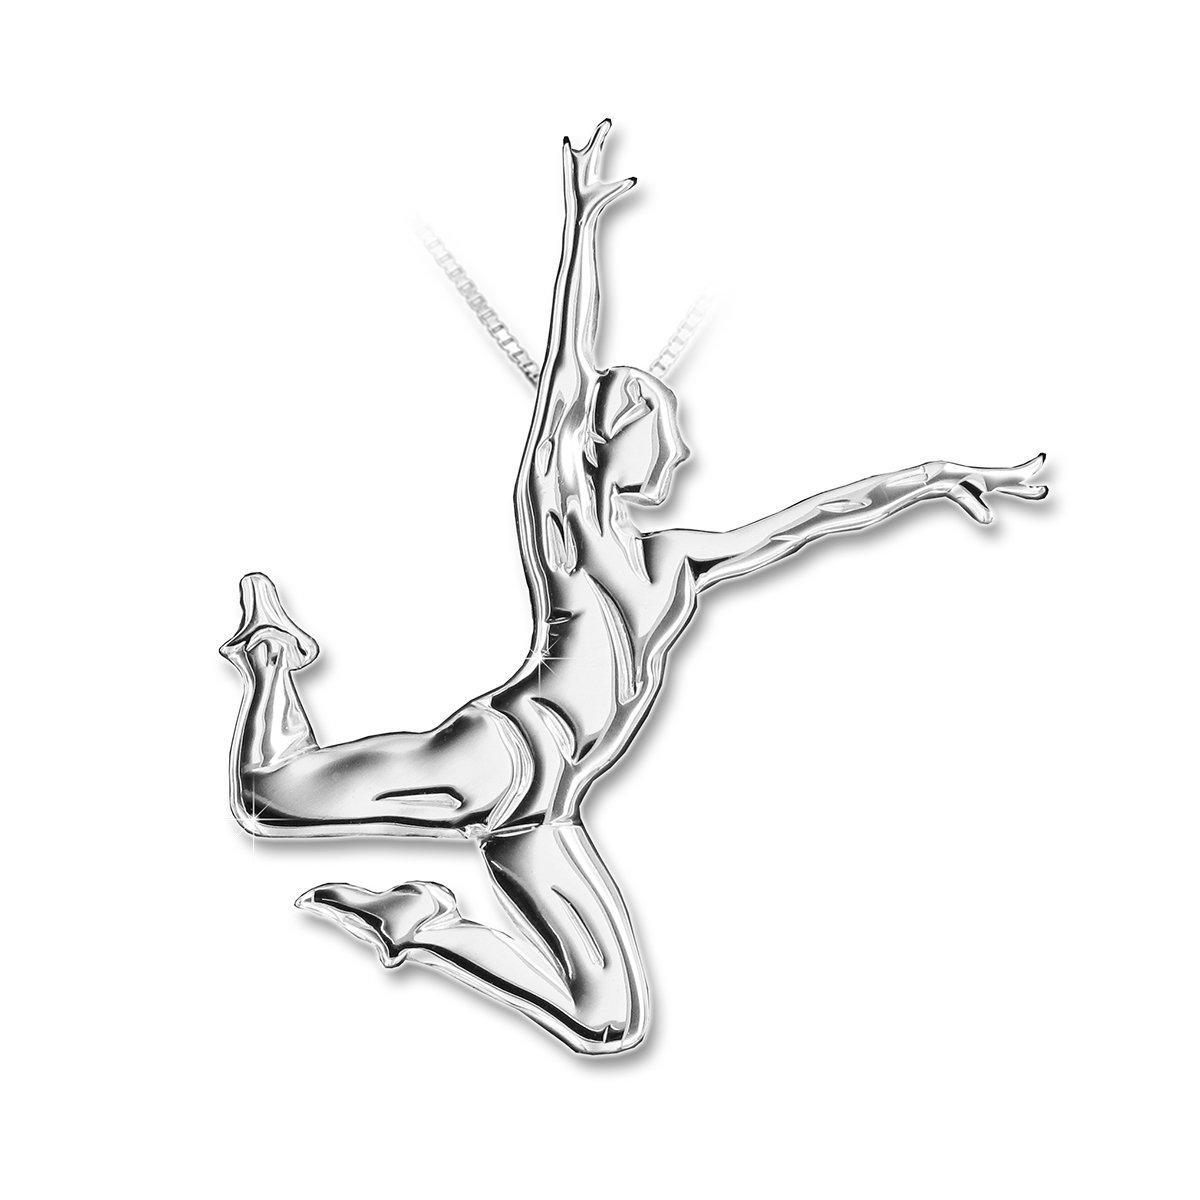 MIKELART Aerobic Gymnastics Jewellery Pendant Jump enjamb/è